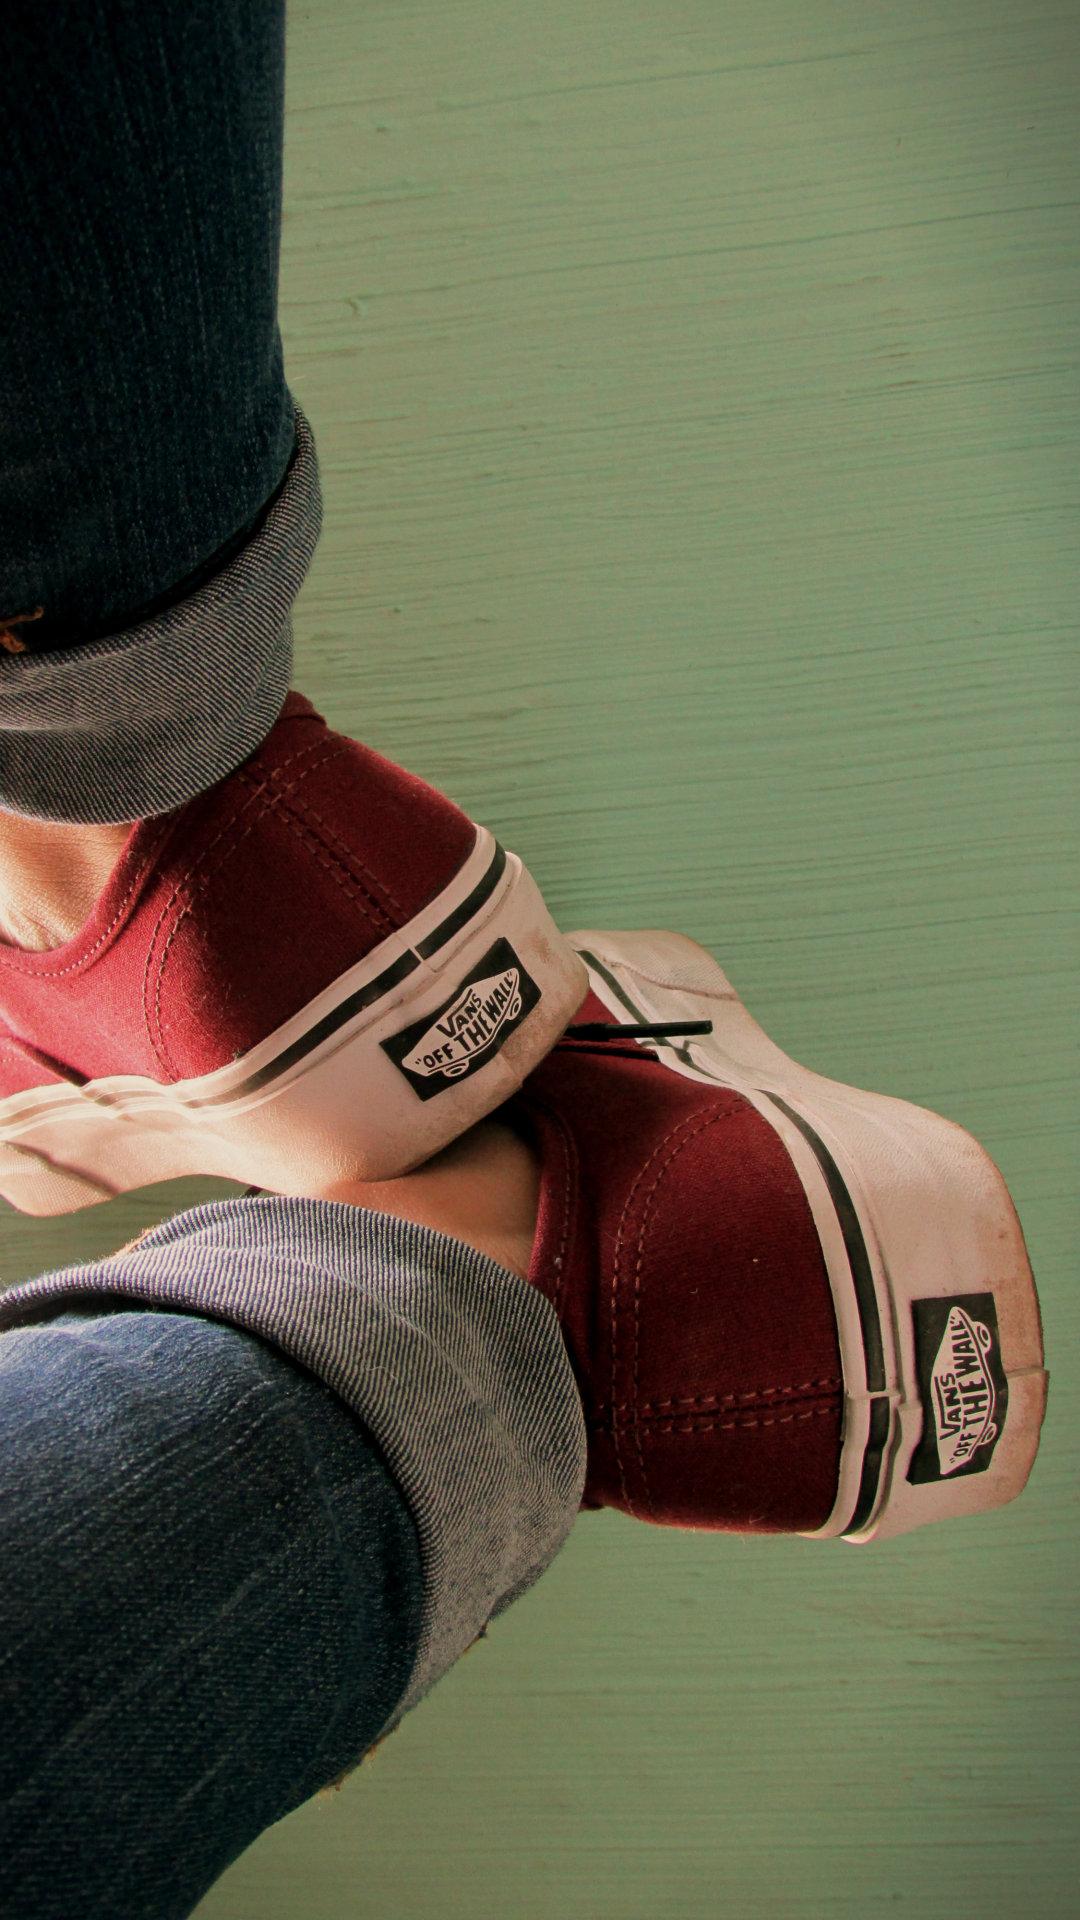 skate vans photography Cool shoes indie Grunge vans off ...